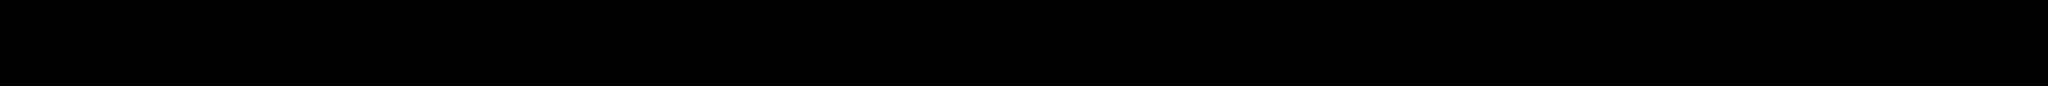 BREMBO 1J0615115, 1J0698151, 1J0698151A, 1J0698151B, 1J0698151C Bremsbelagsatz, Scheibenbremse